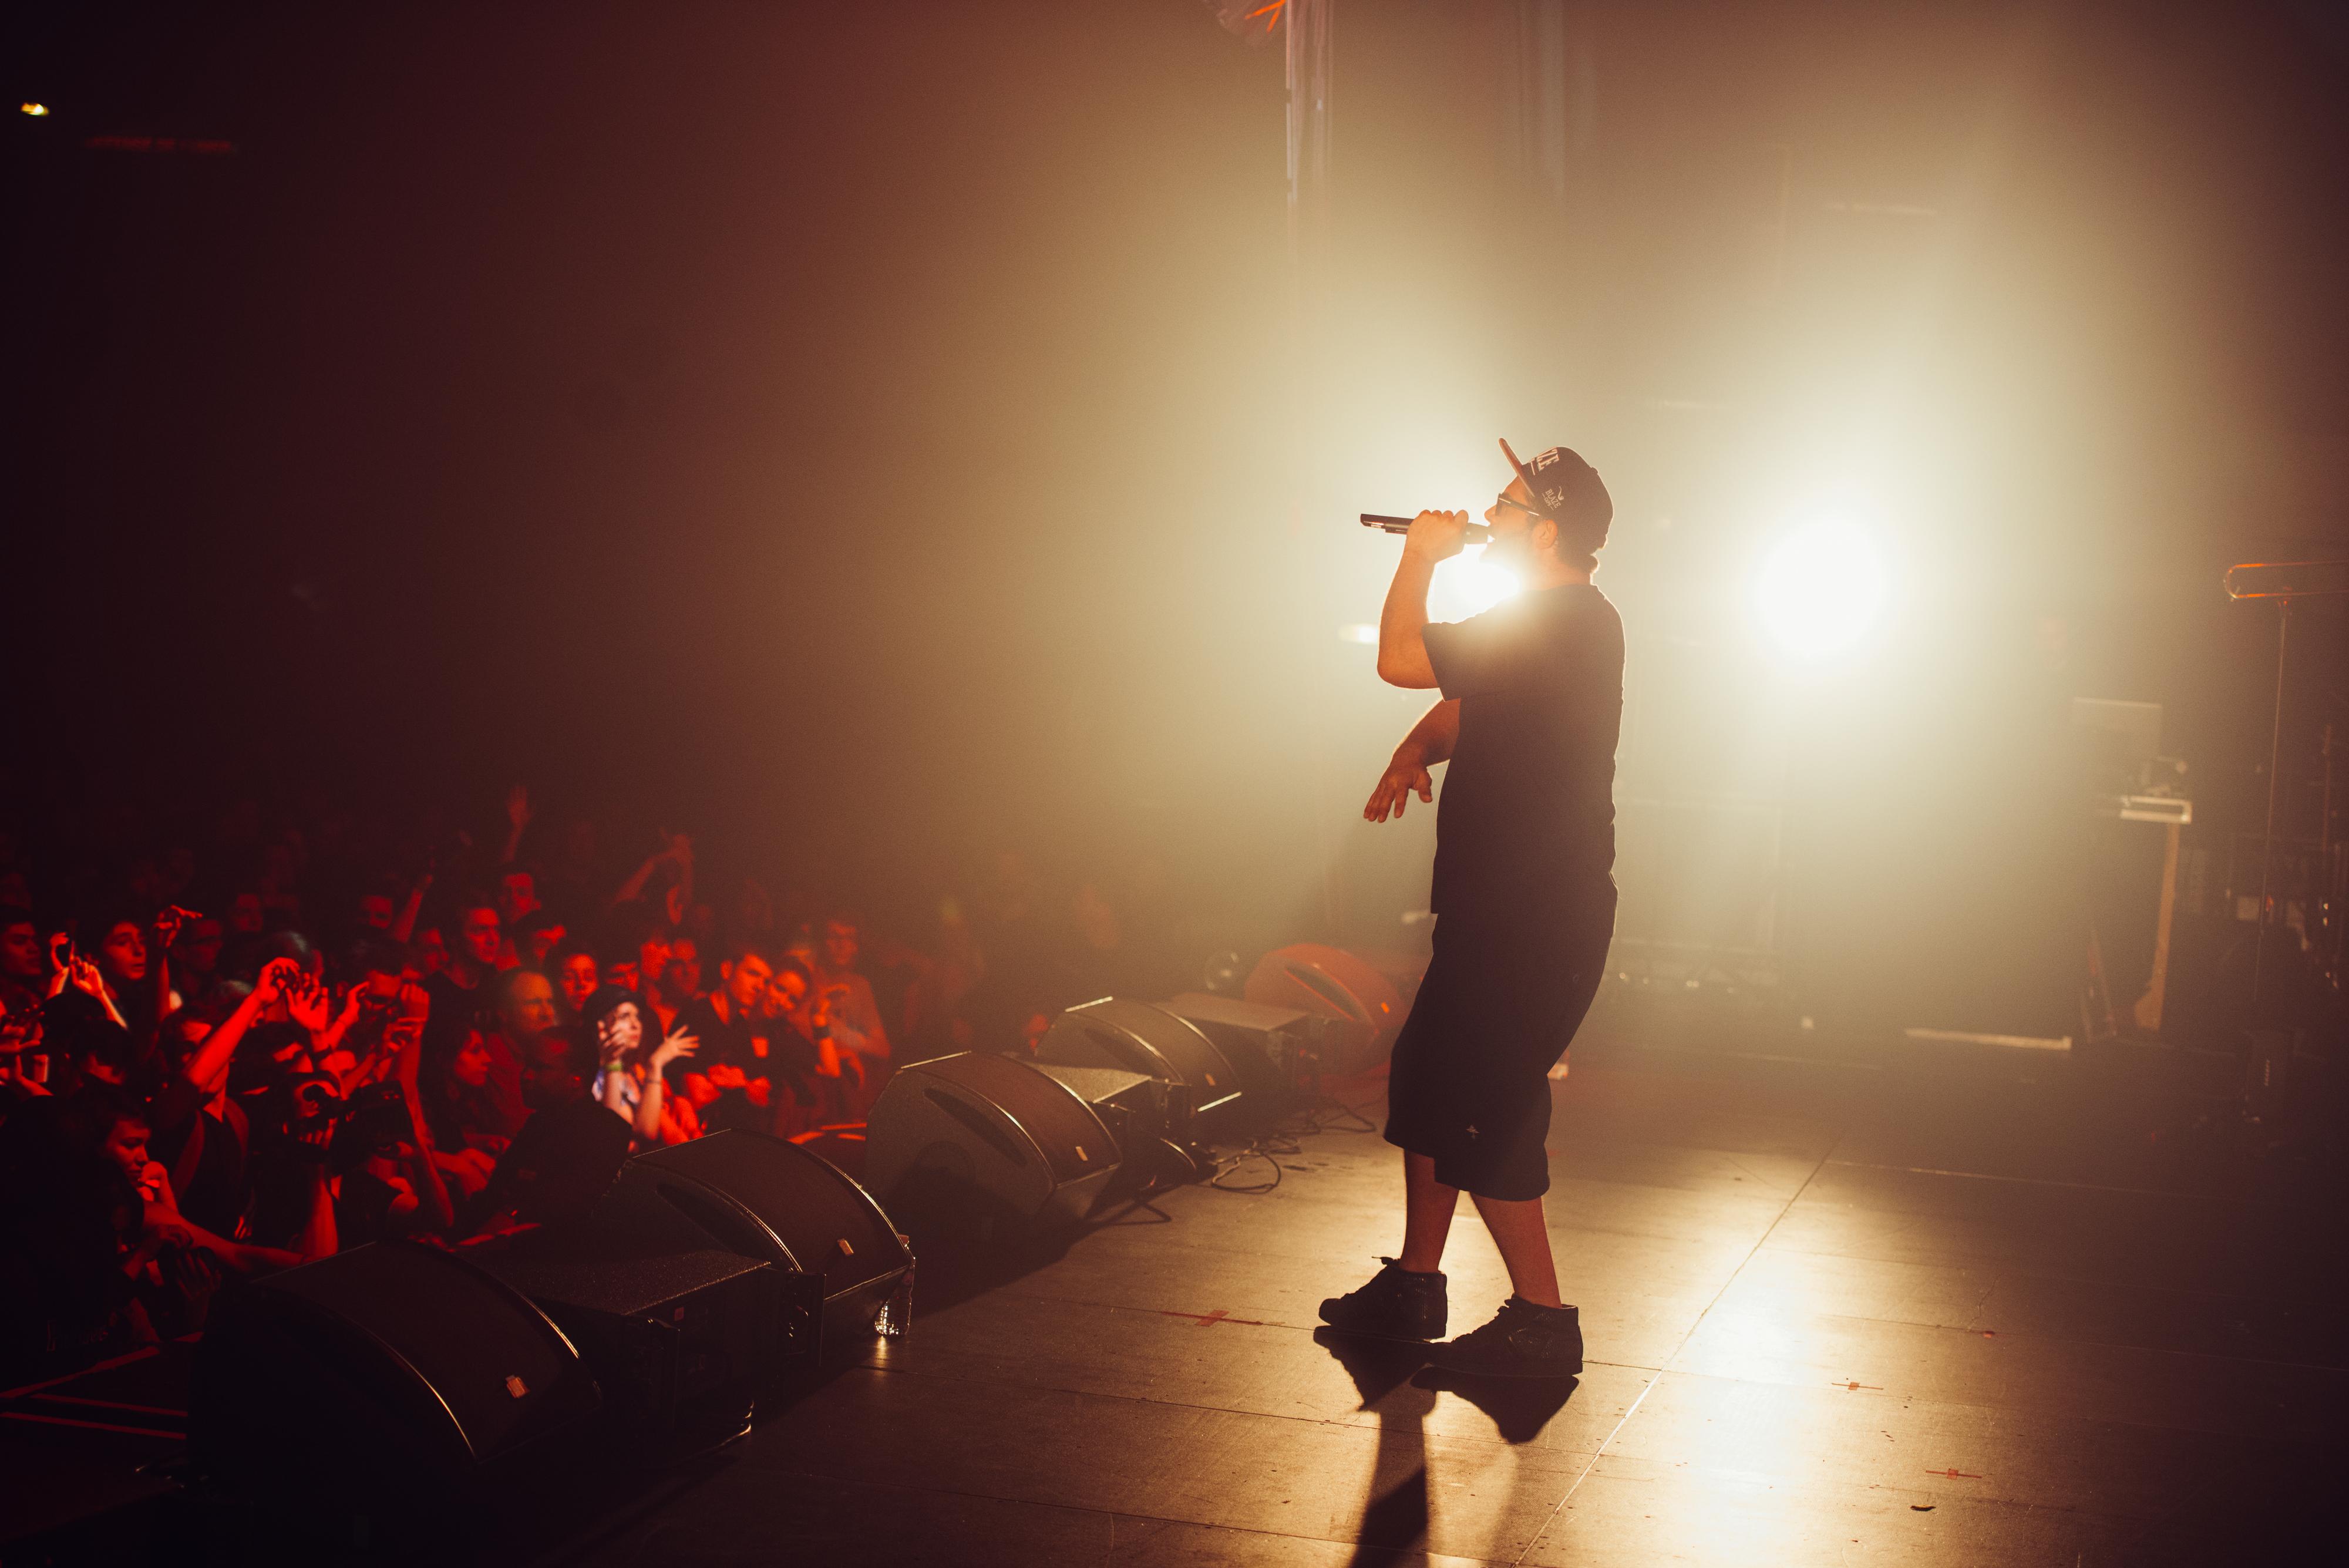 Taiwan MC – Heavy This Year (verso 2012): www.iwelcom.tv/reggae-dancehall-dub/taiwan-mc/taiwan-mc-diskodub-2014